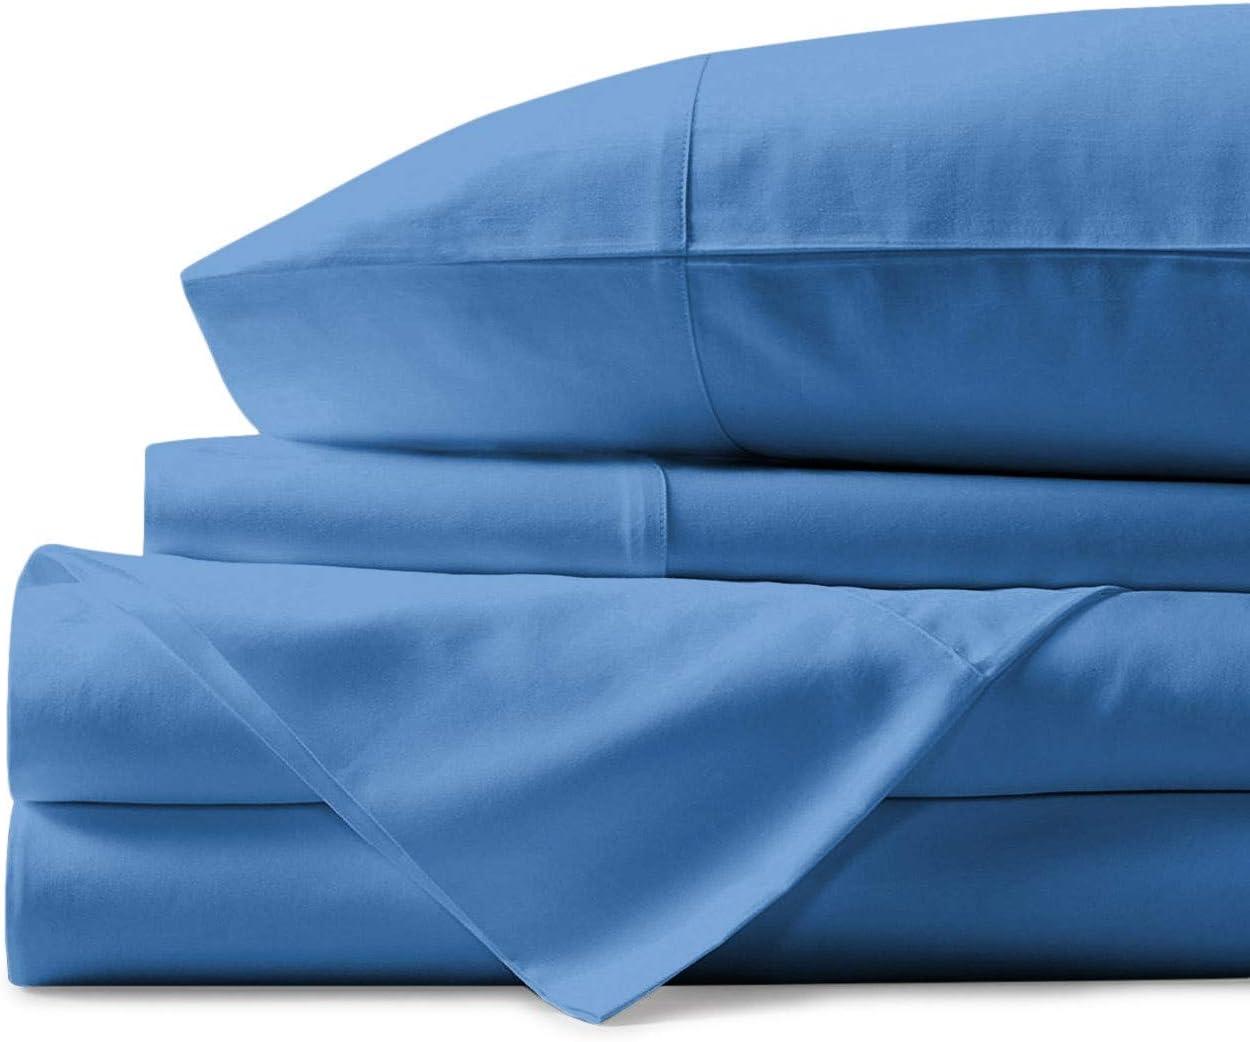 Mayfair Linen 100% Egyptian Cotton Sheets, Deep Blue King Sheets Set, 800 Thread Count Long Staple Cotton, Sateen Weave for Soft and Silky Feel, Fits Mattress Upto 18'' DEEP Pocket.